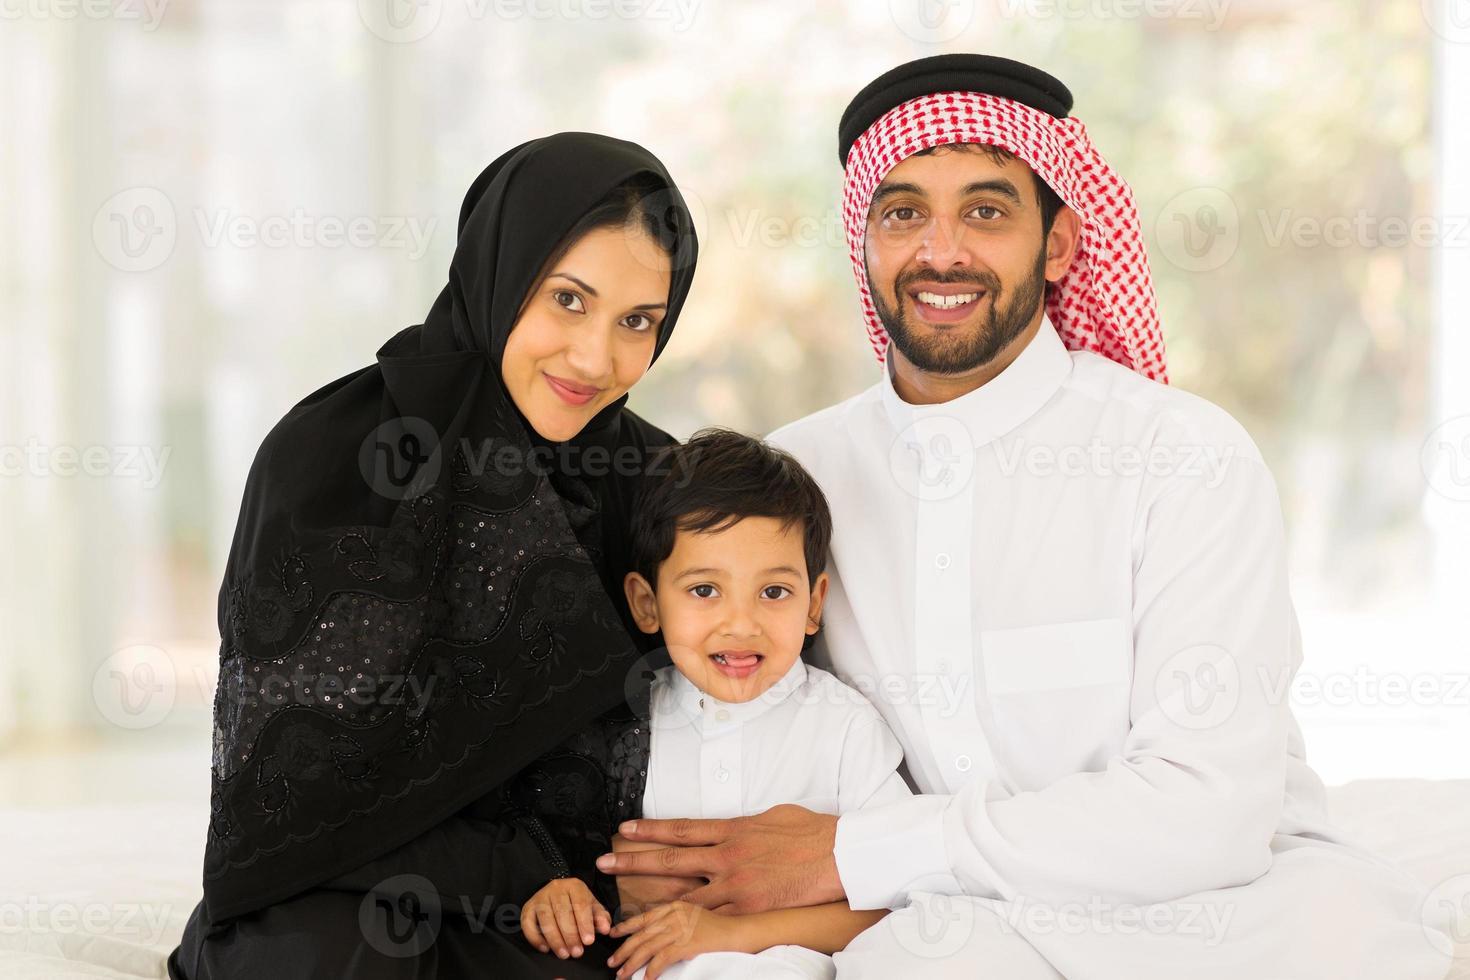 muslimsk familj som sitter hemma foto